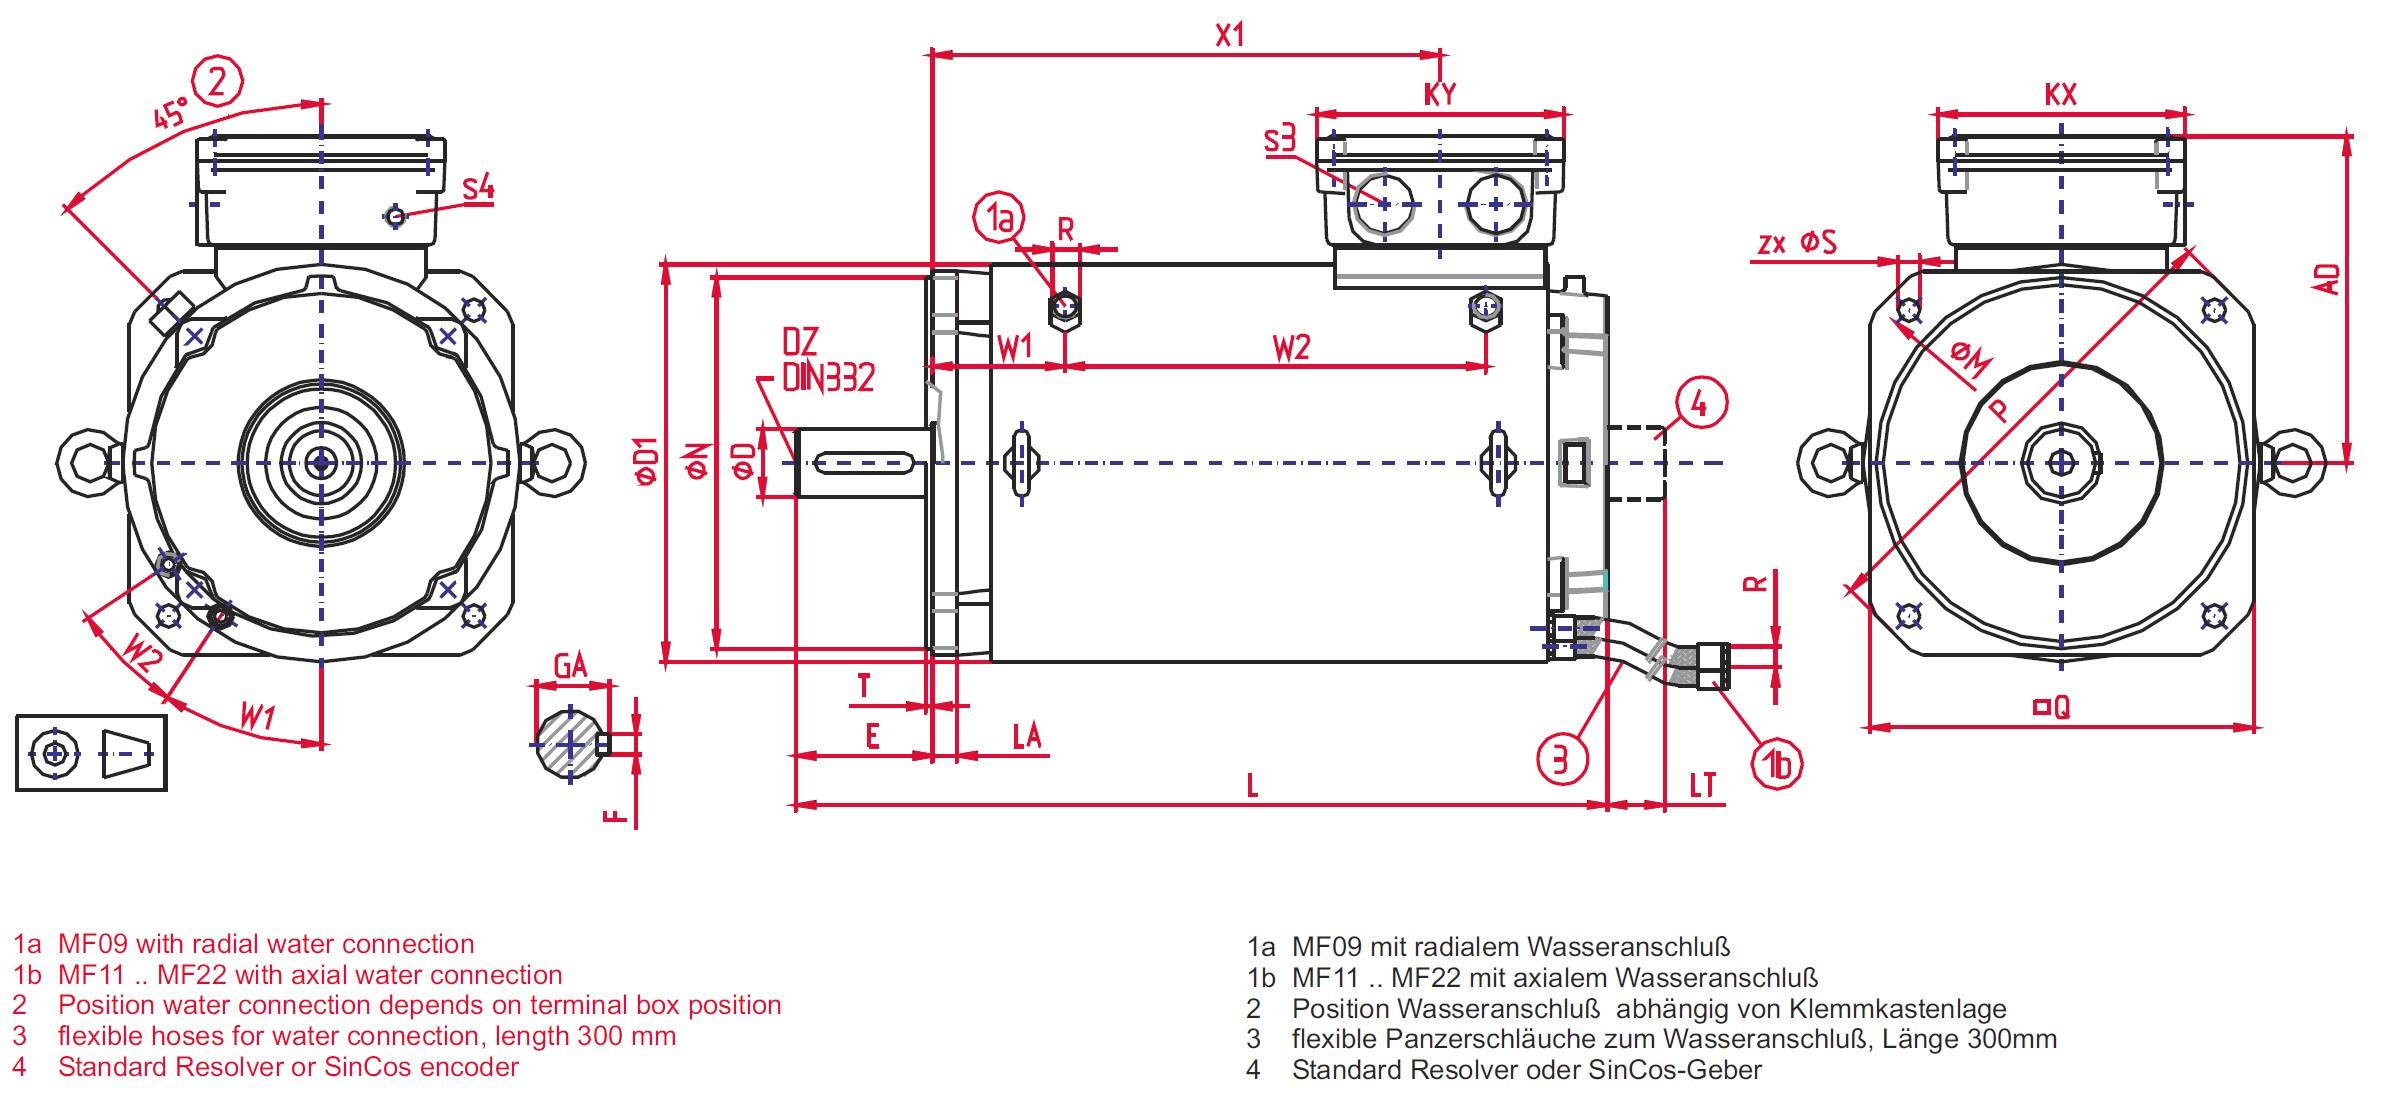 Motor Wiring Diagram 3 Phase Single Switch Oswald Mf Synchronous Motors Of